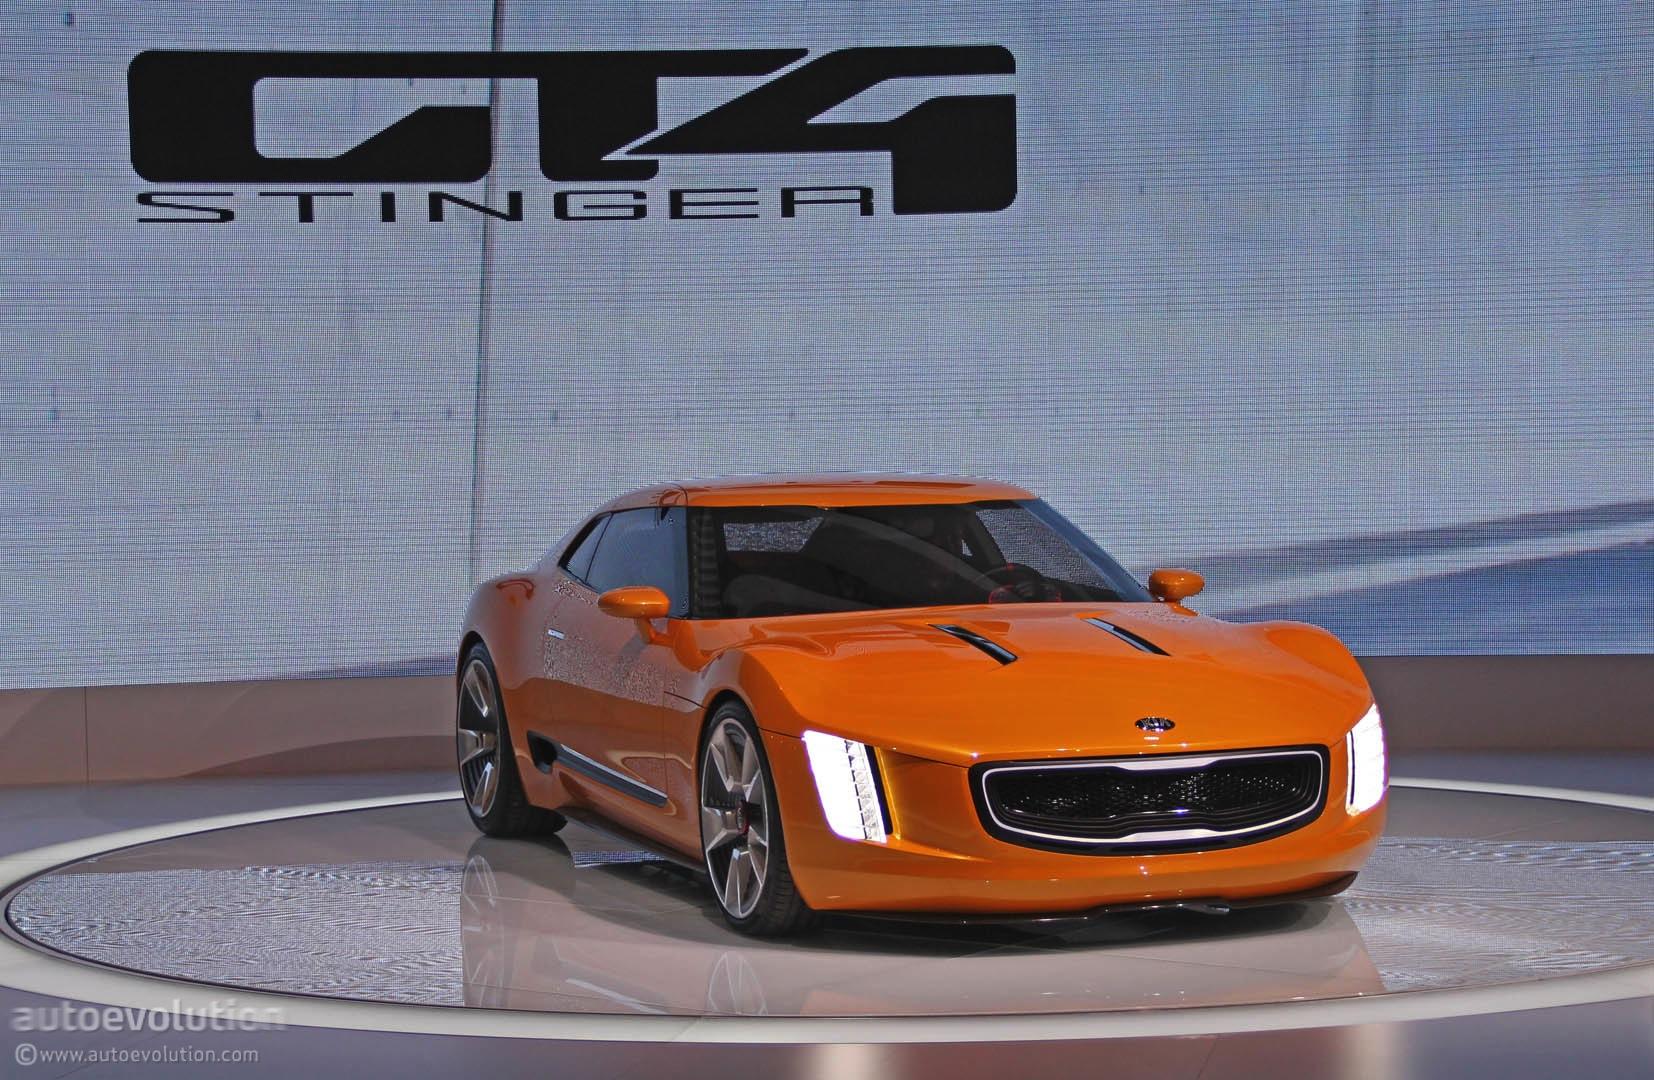 kia gt4 stinger concept 5886 cars performance reviews and test drive. Black Bedroom Furniture Sets. Home Design Ideas